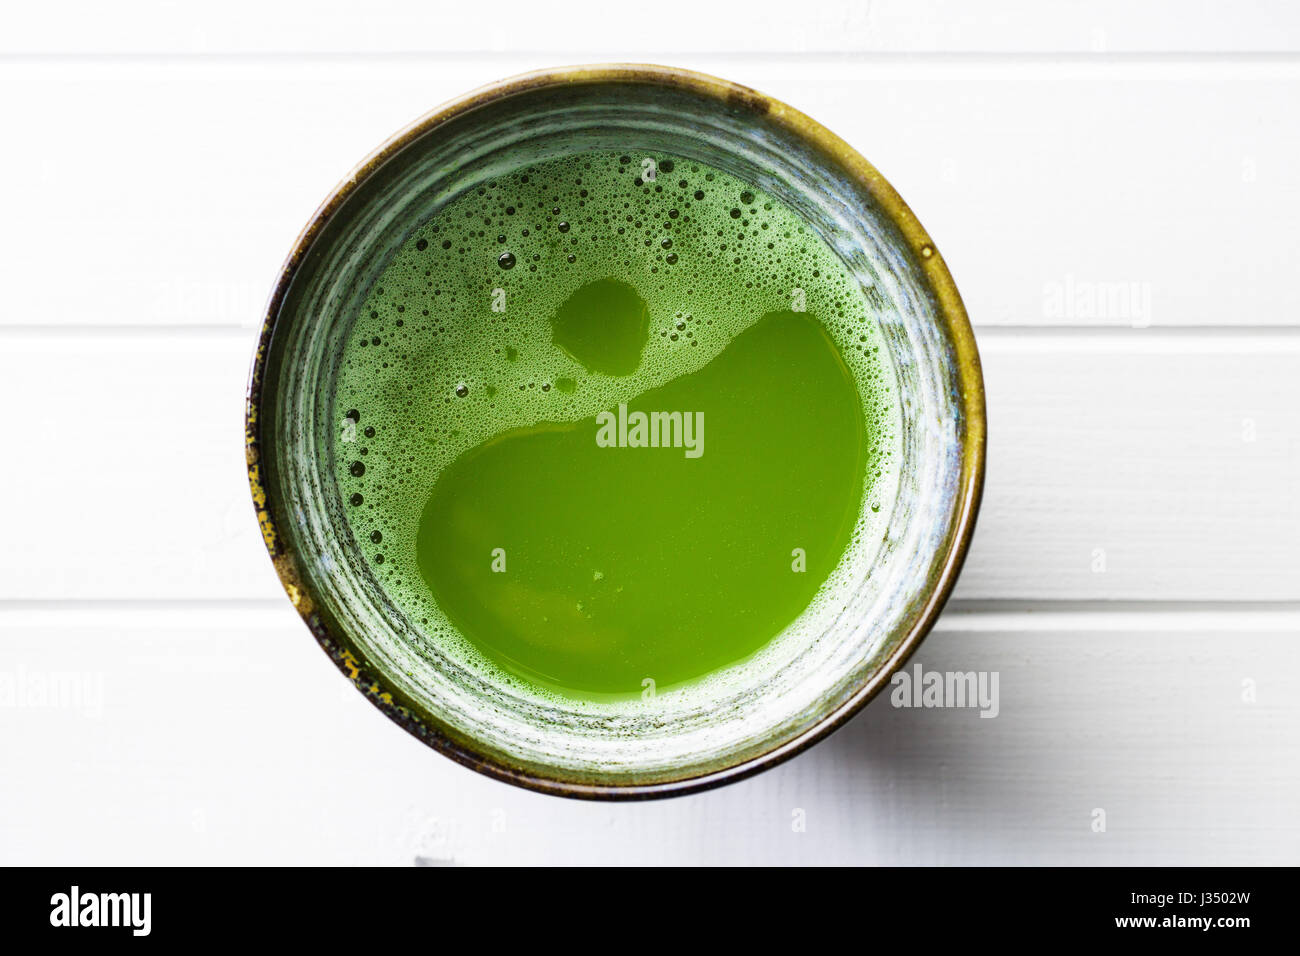 Green thé matcha dans un bol. Photo Stock